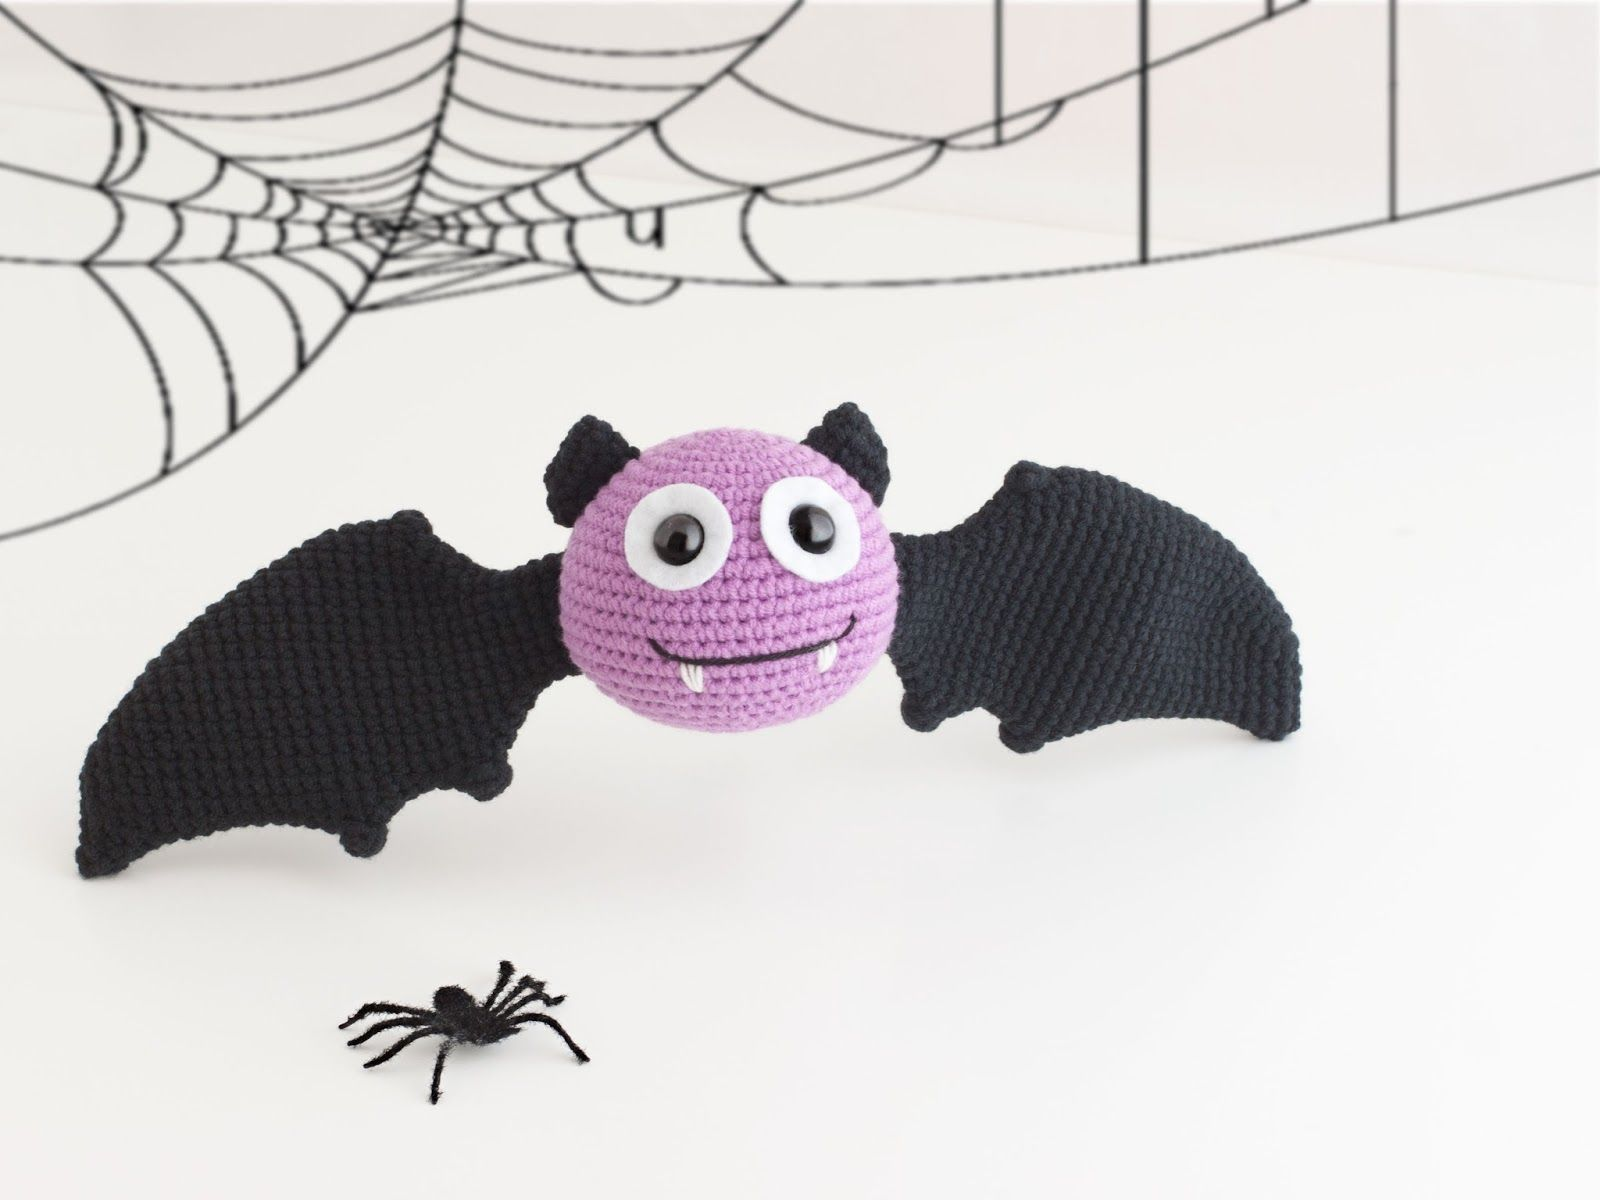 Amigurumi murciélago (enlace a patrón gratis) | Juguetes | Pinterest ...